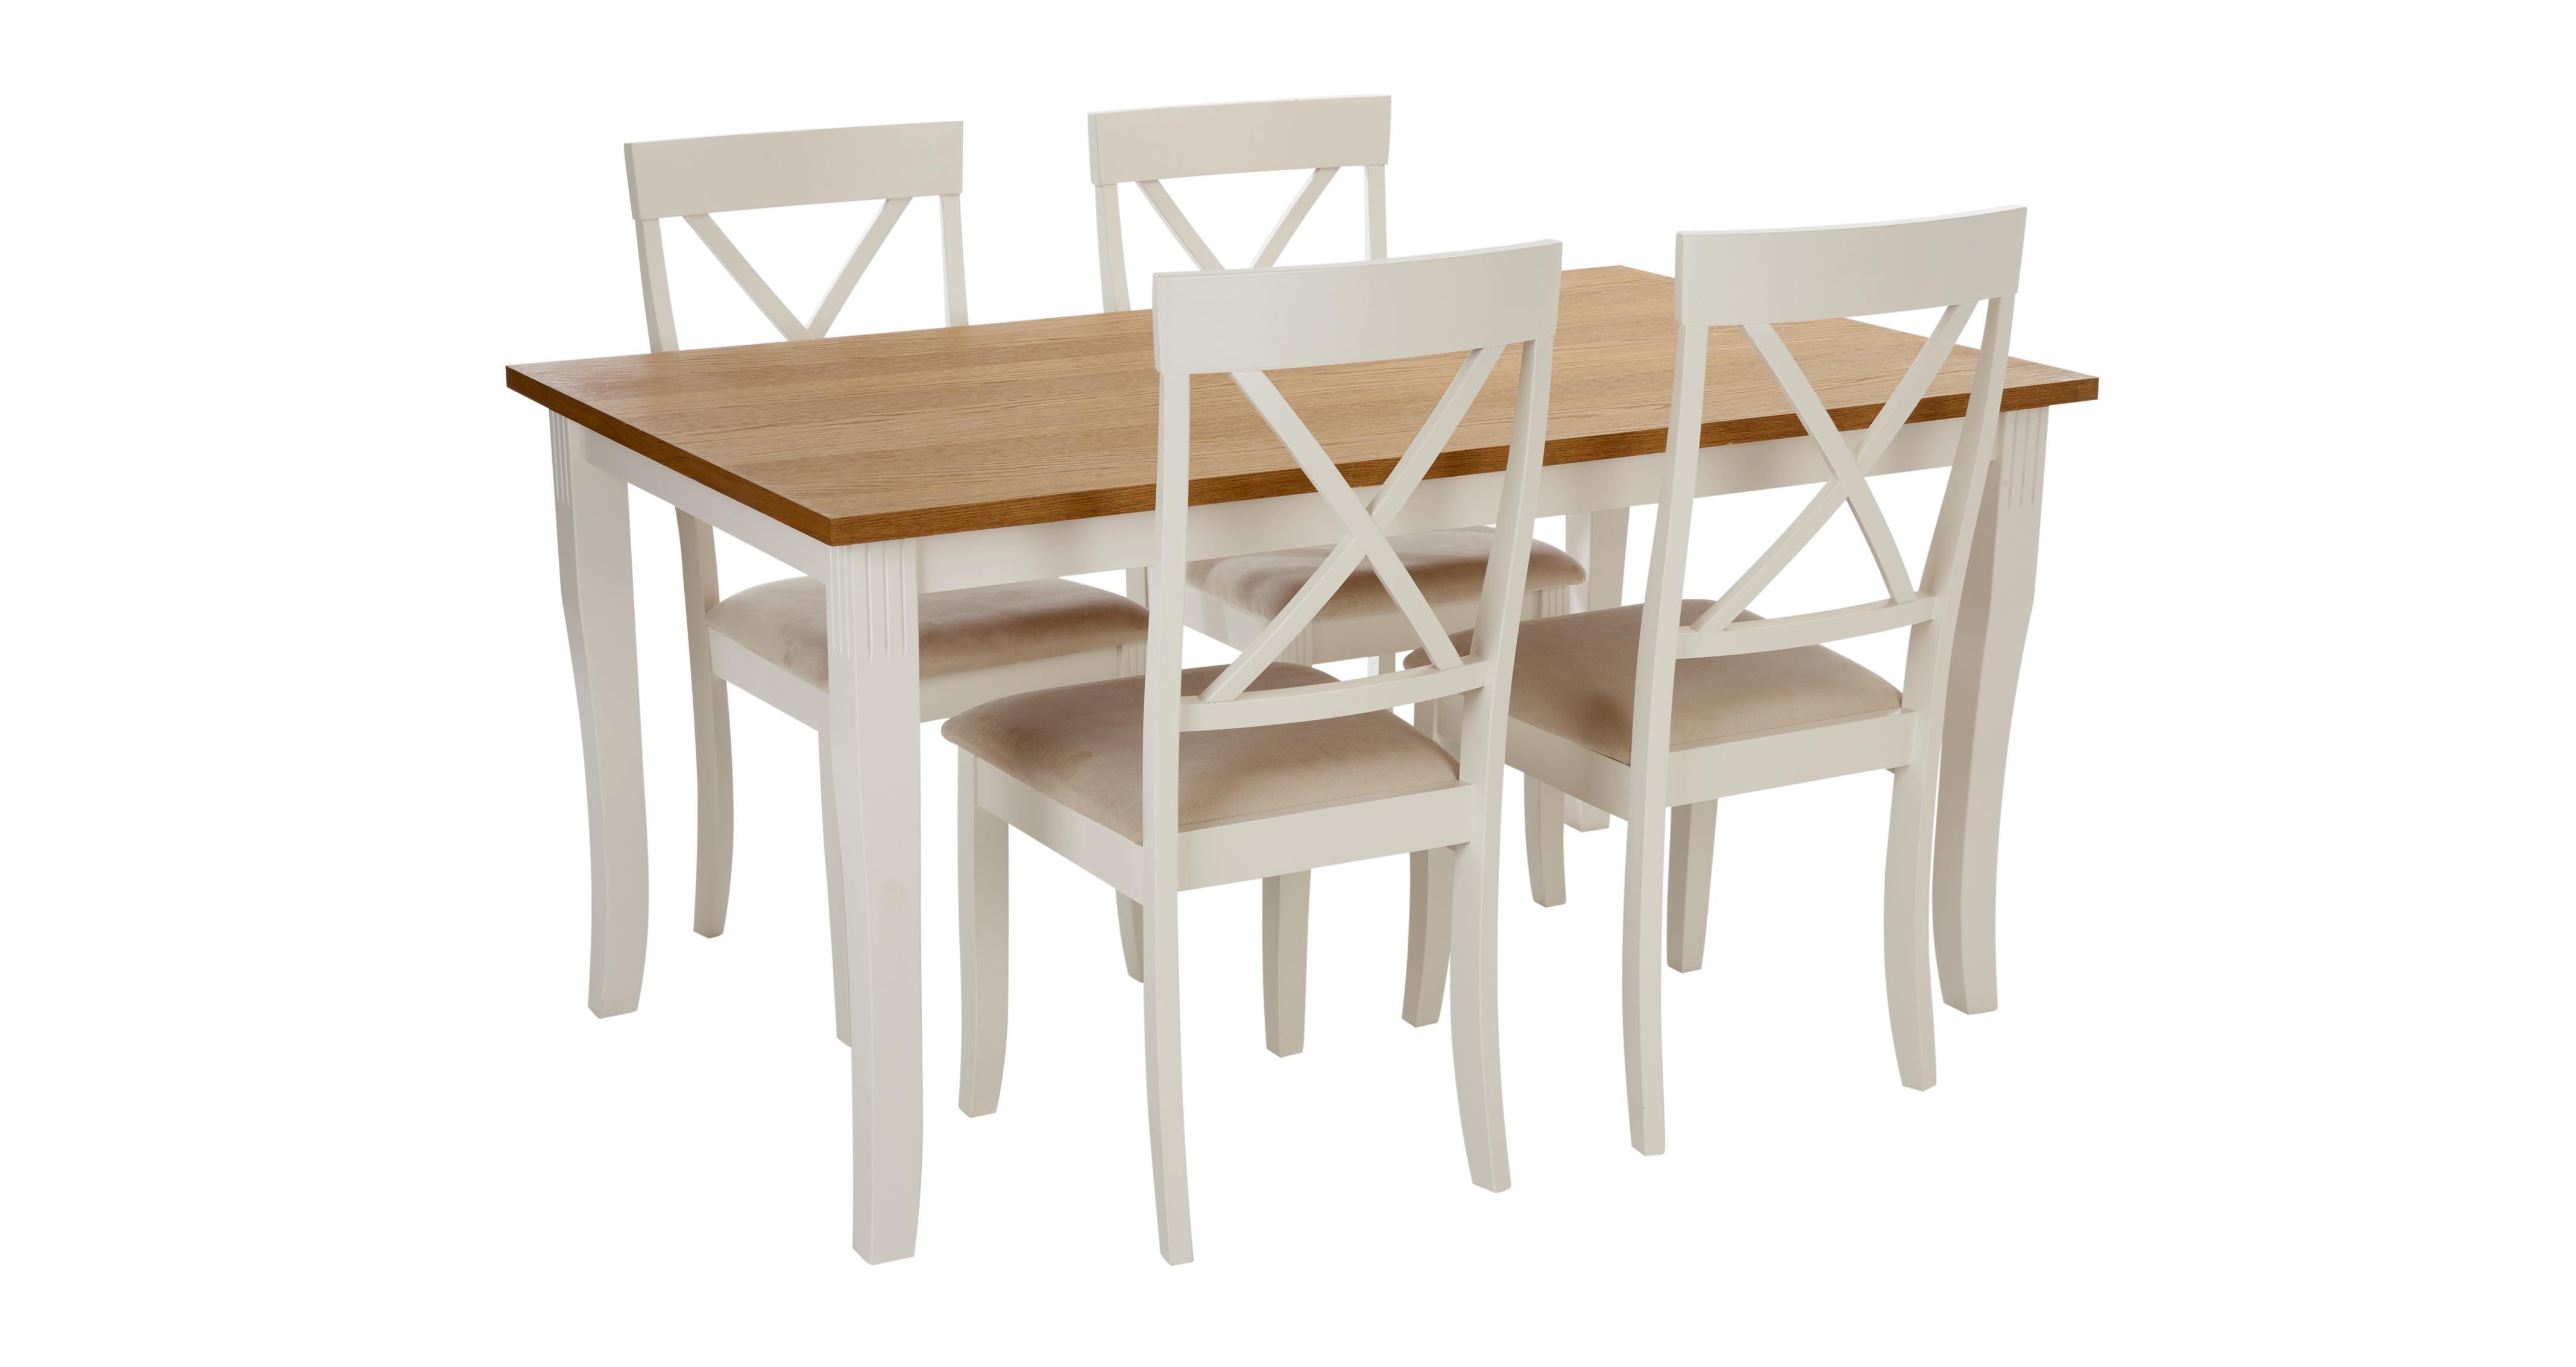 Astonishing Evesham Rectangular Dining Table 4 Chairs Download Free Architecture Designs Viewormadebymaigaardcom